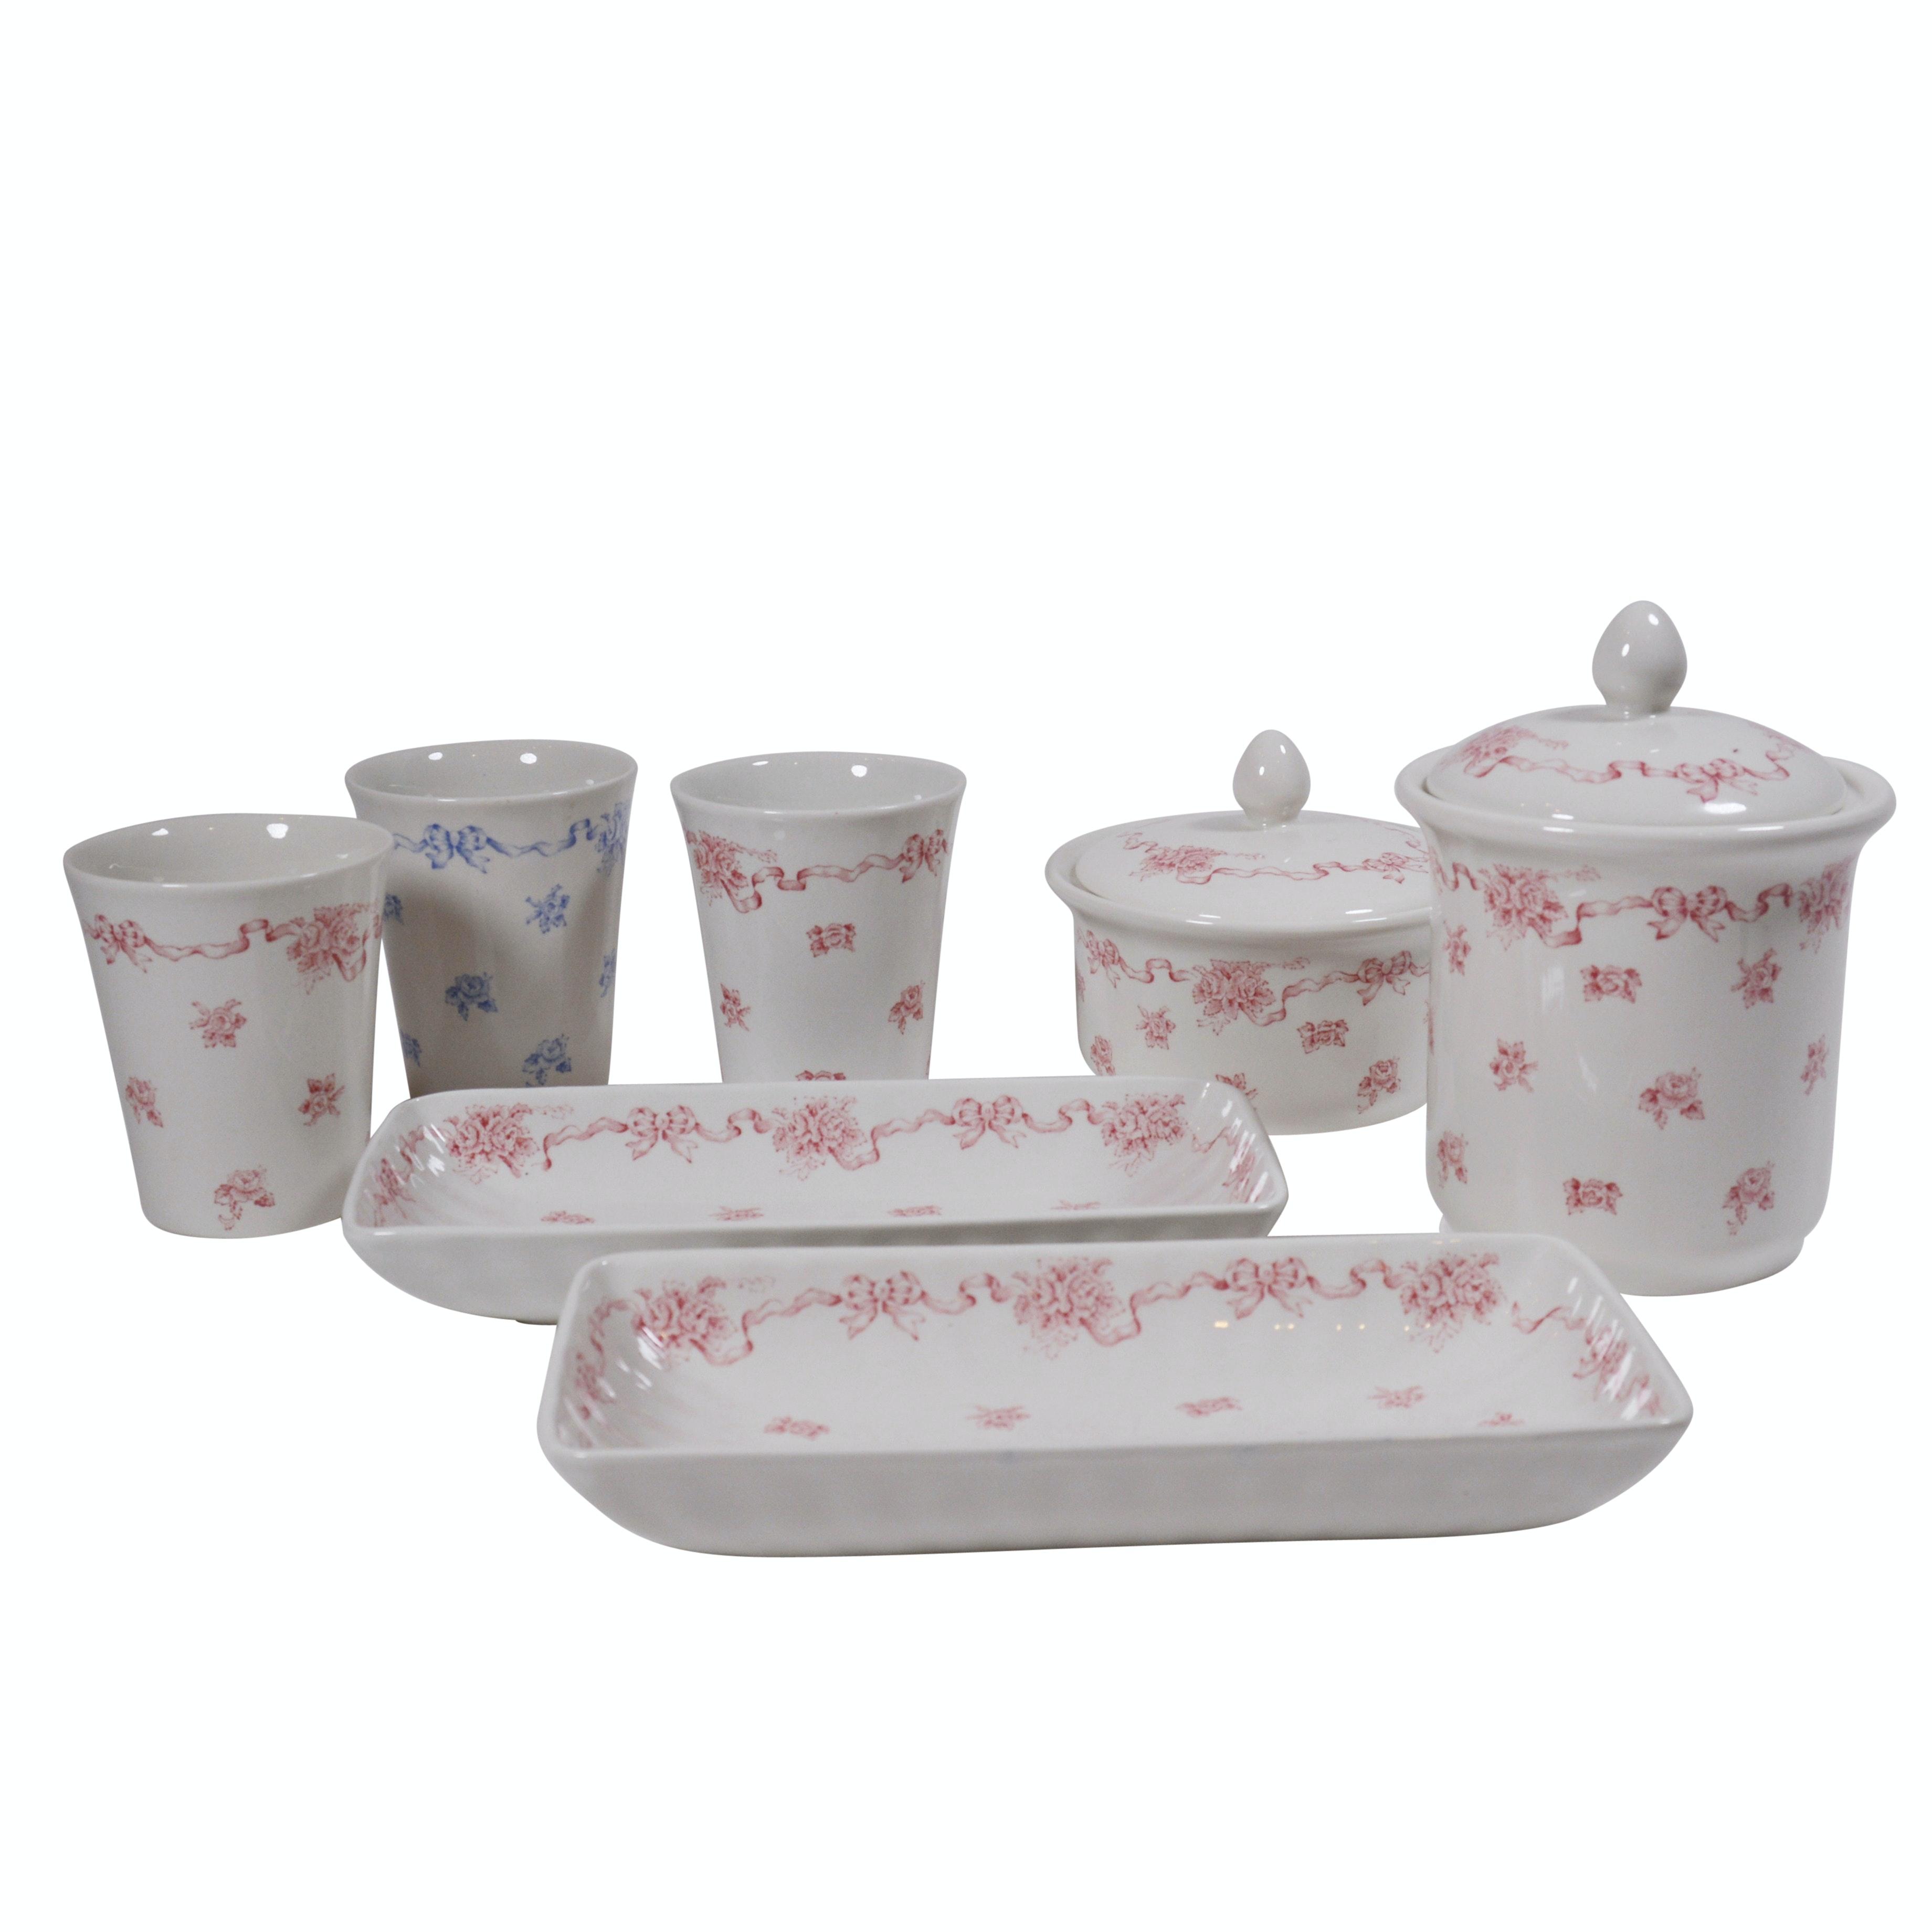 "Laura Ashley ""Ribbons"" Porcelain Vanity Set"